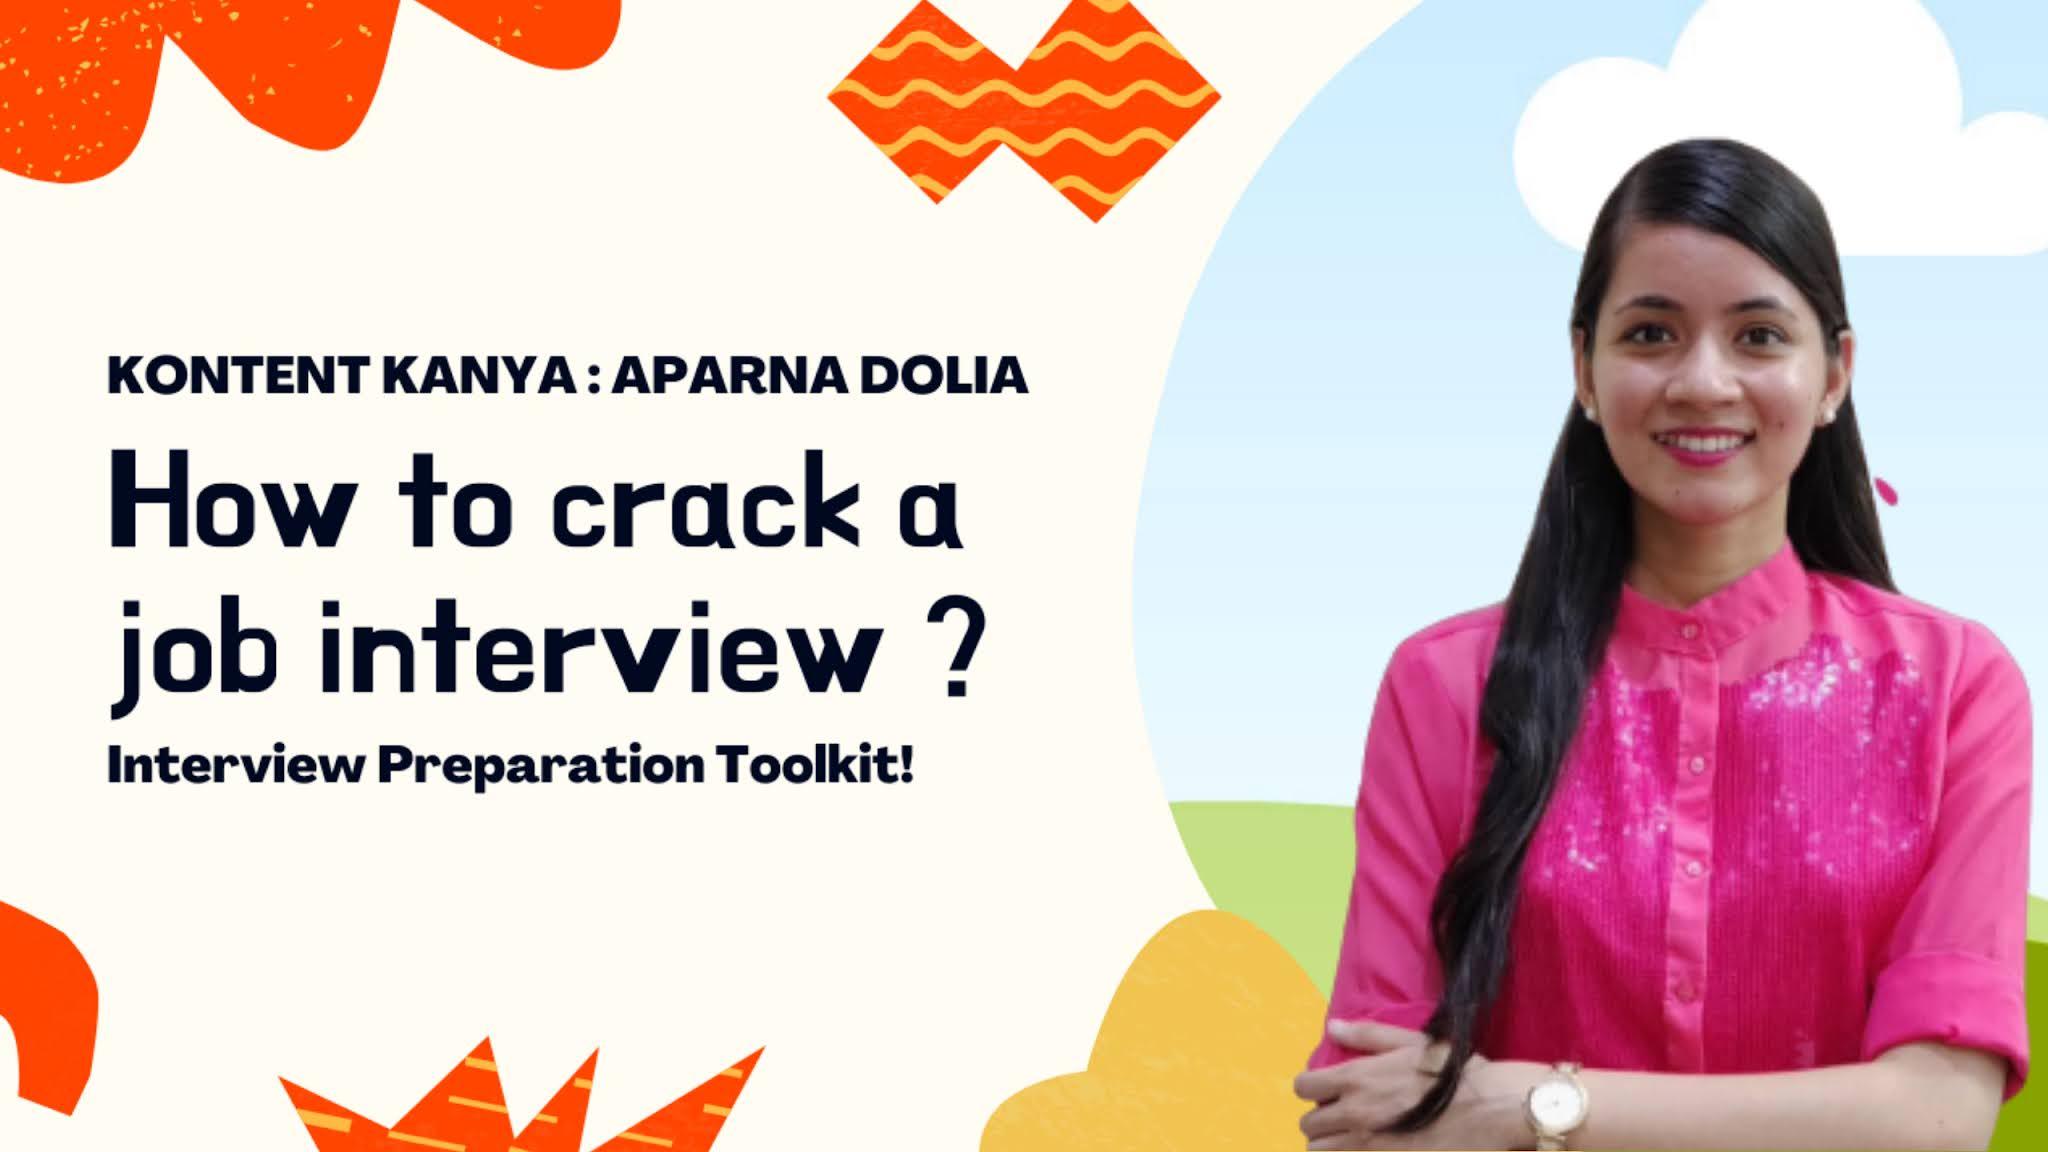 How to crack a job interview: Interview Preparation Toolkit | Kontent Kanya